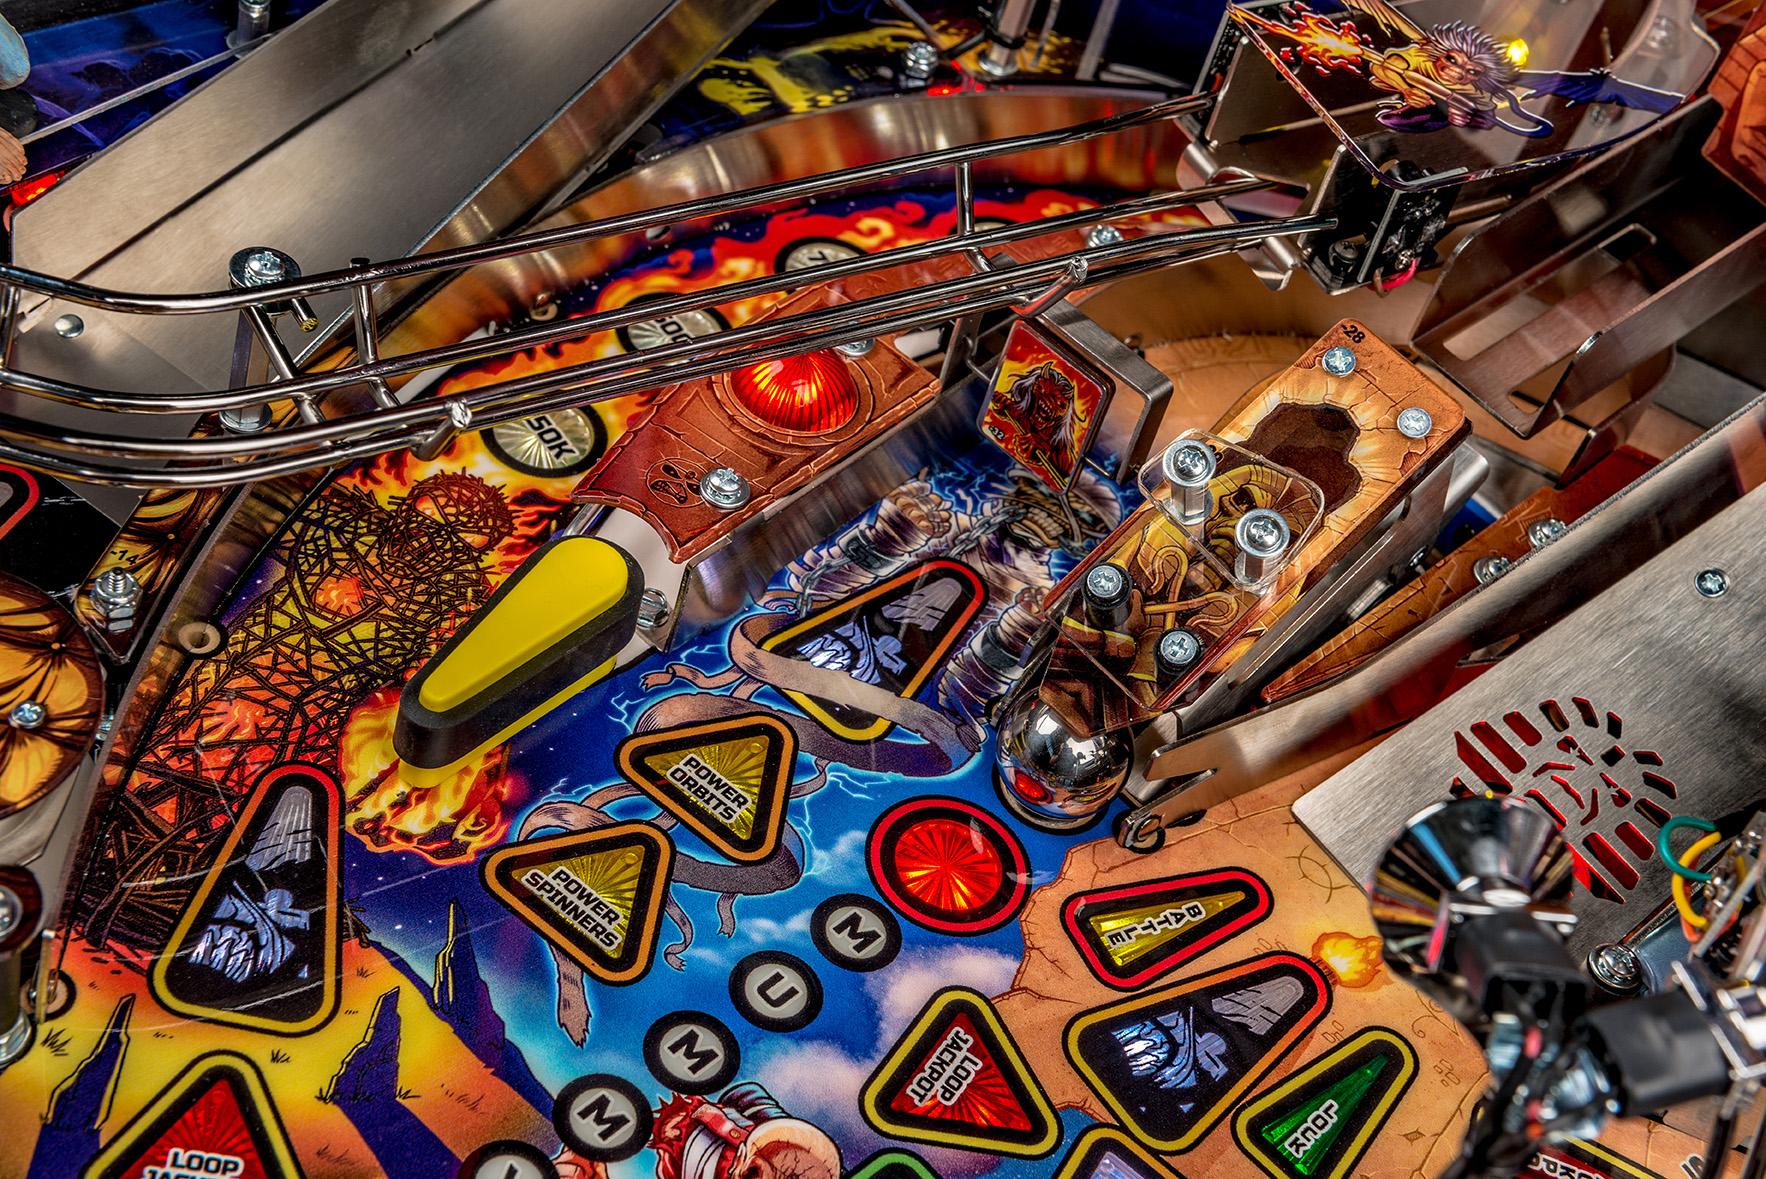 Iron-Maiden-Pinball-Machine-24a